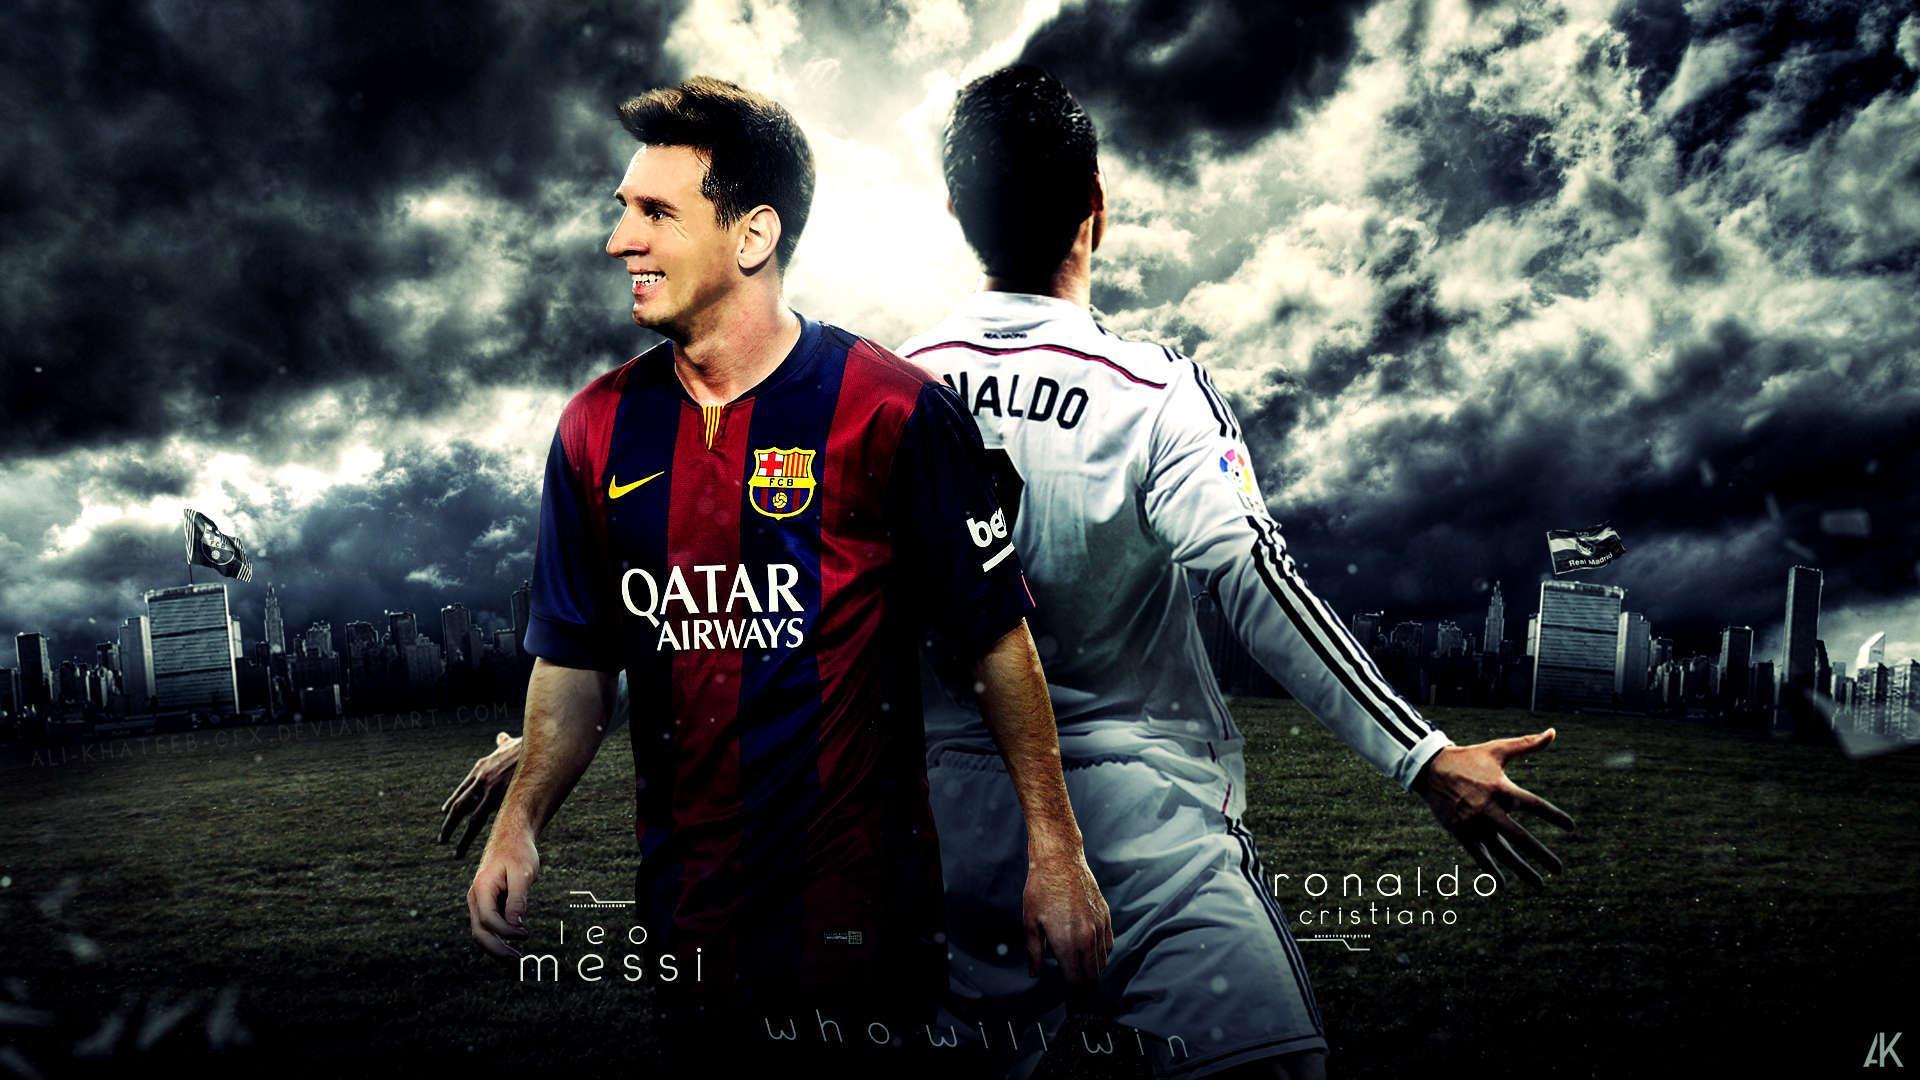 ronaldo football wallpapers hd - photo #41